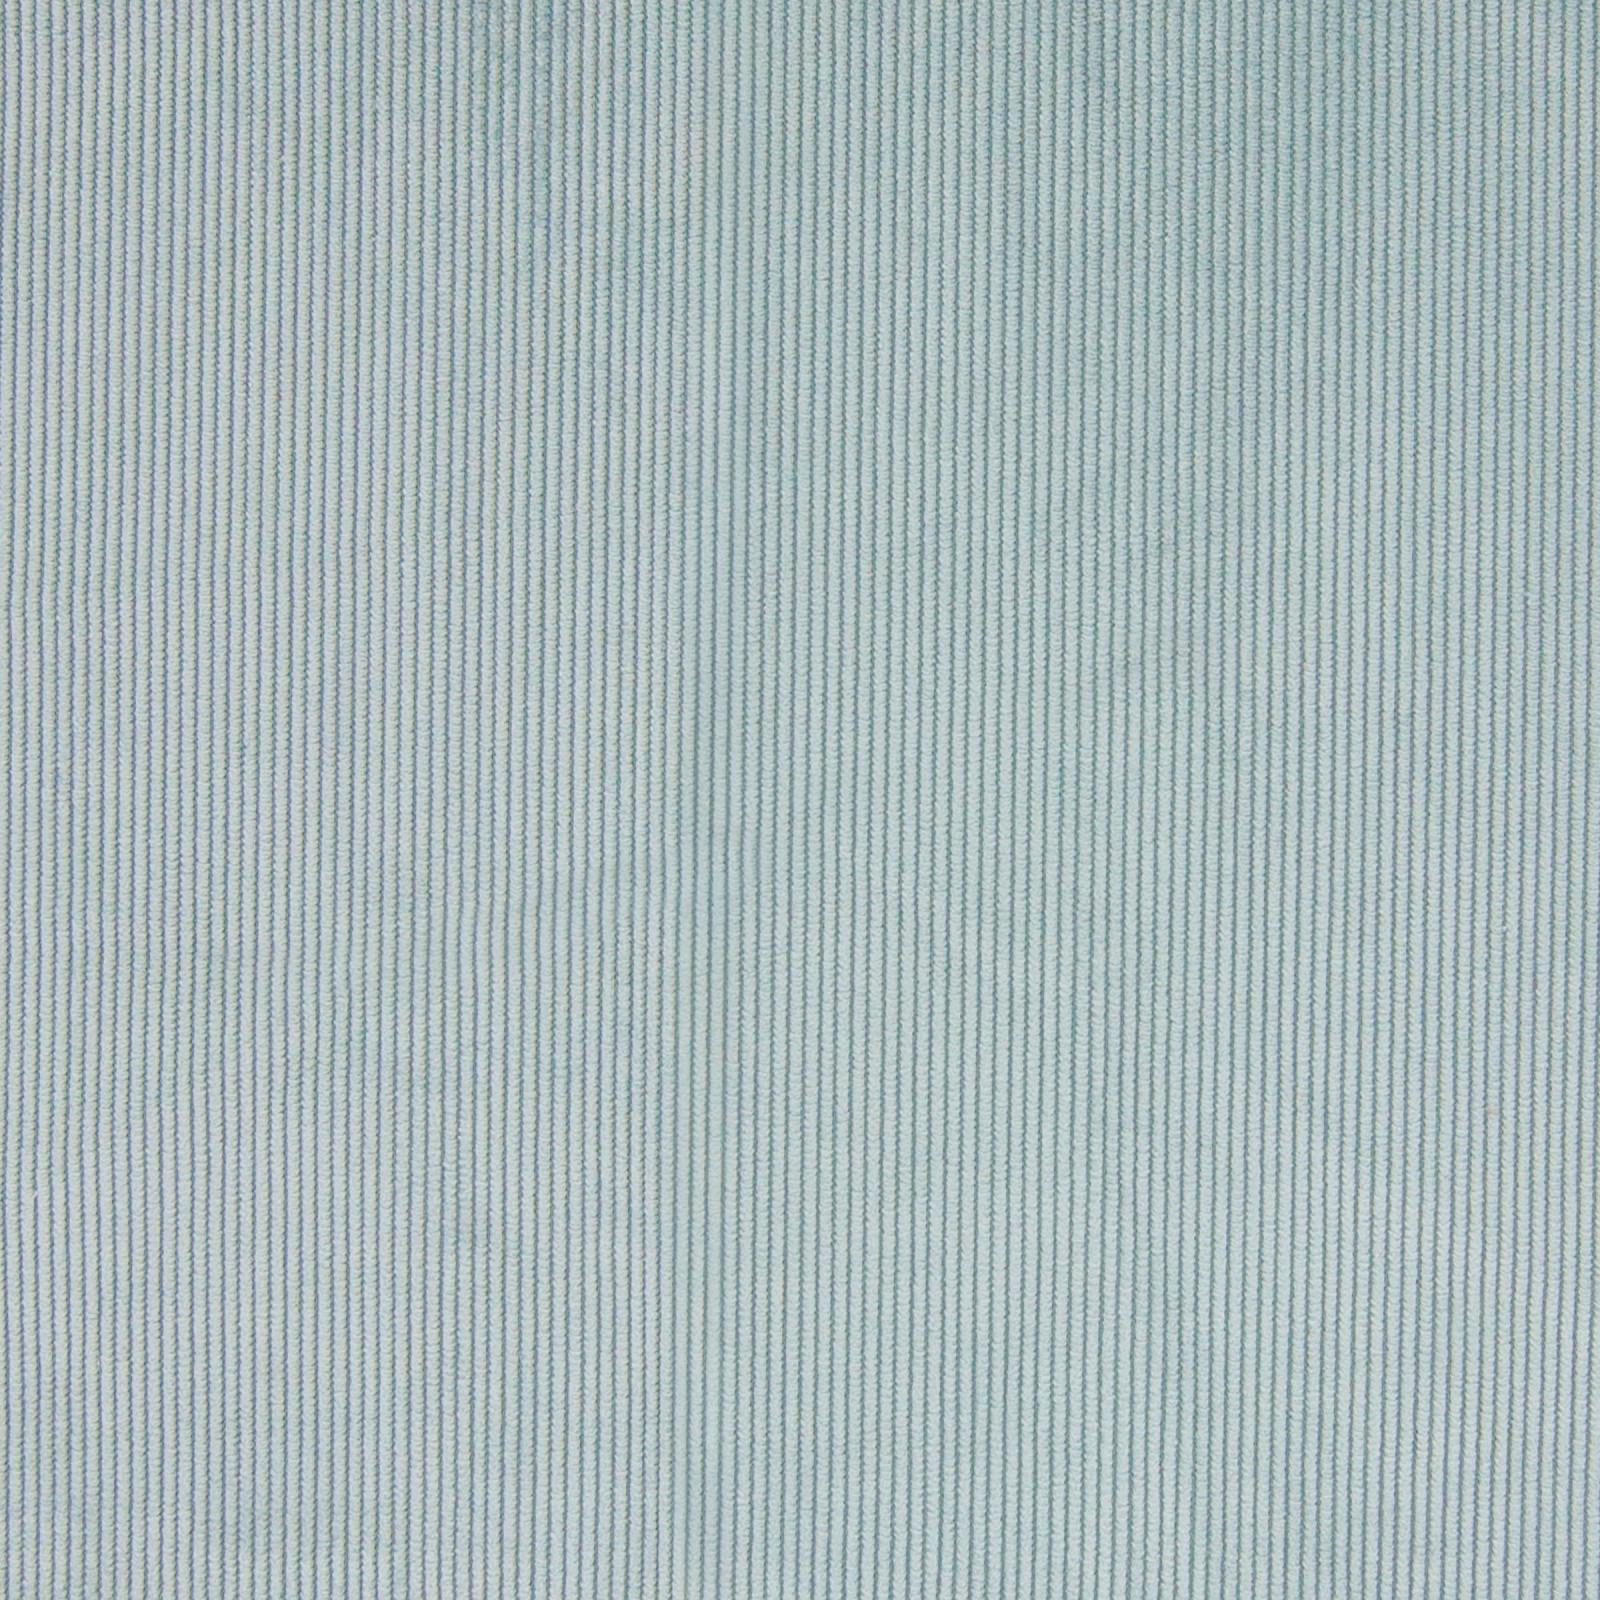 B7587 Ice Greenhouse Fabrics